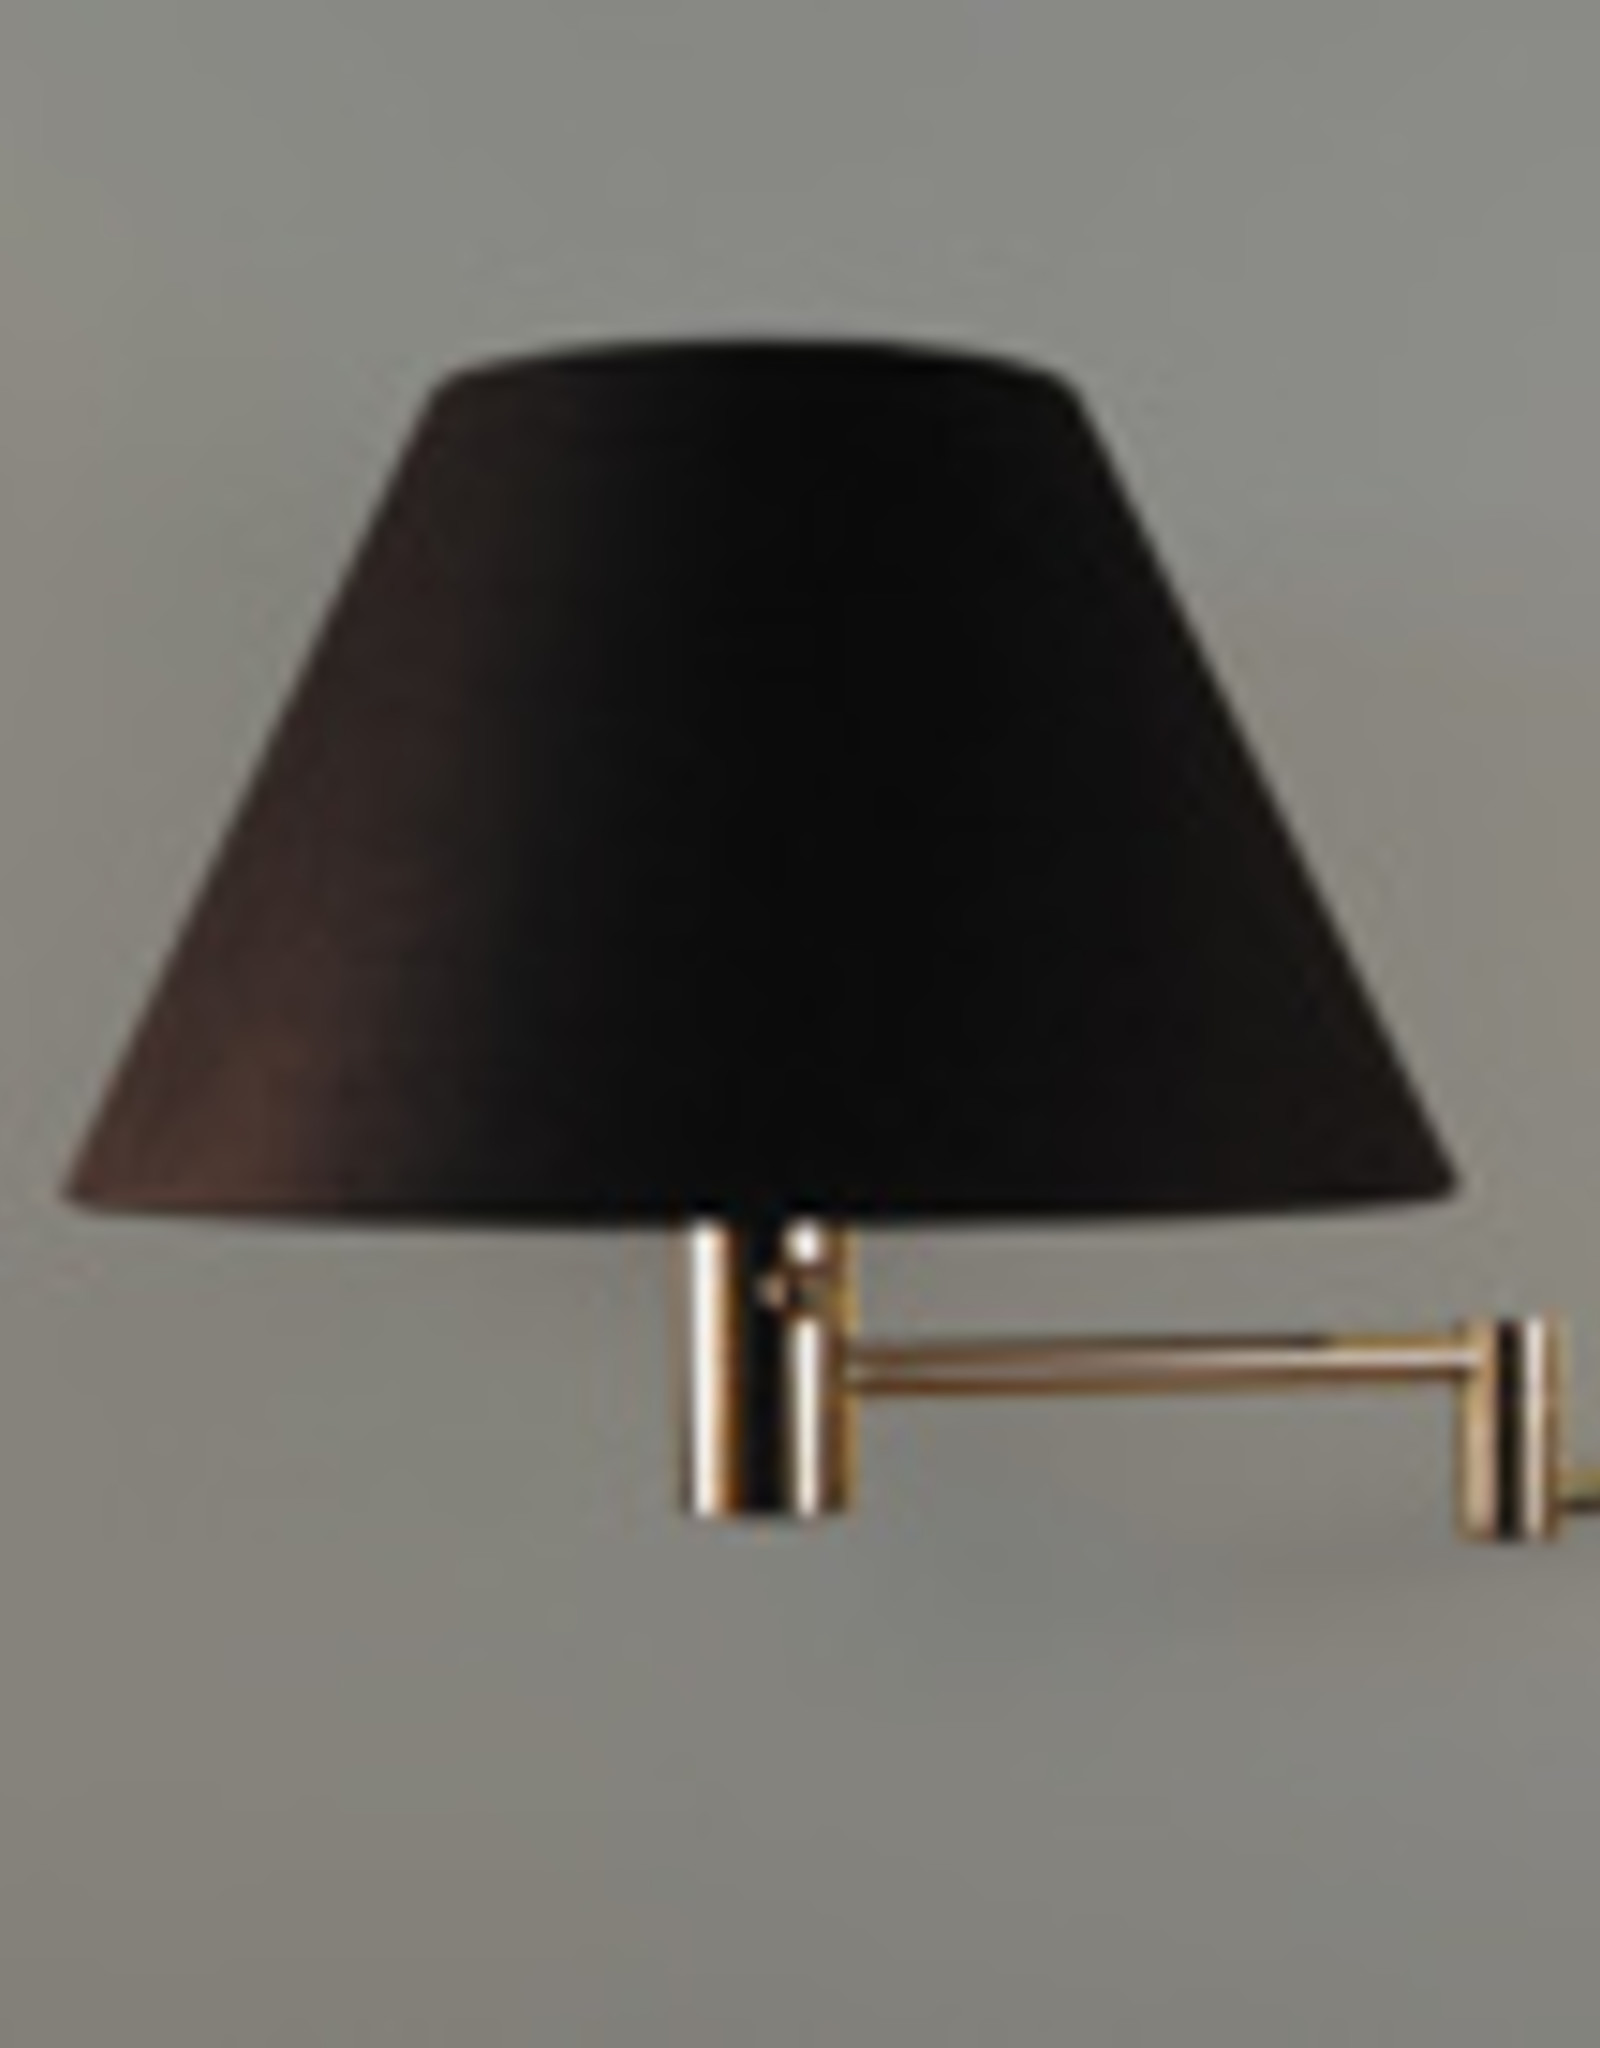 Casella Black Replacement OB Shade - Diffuser